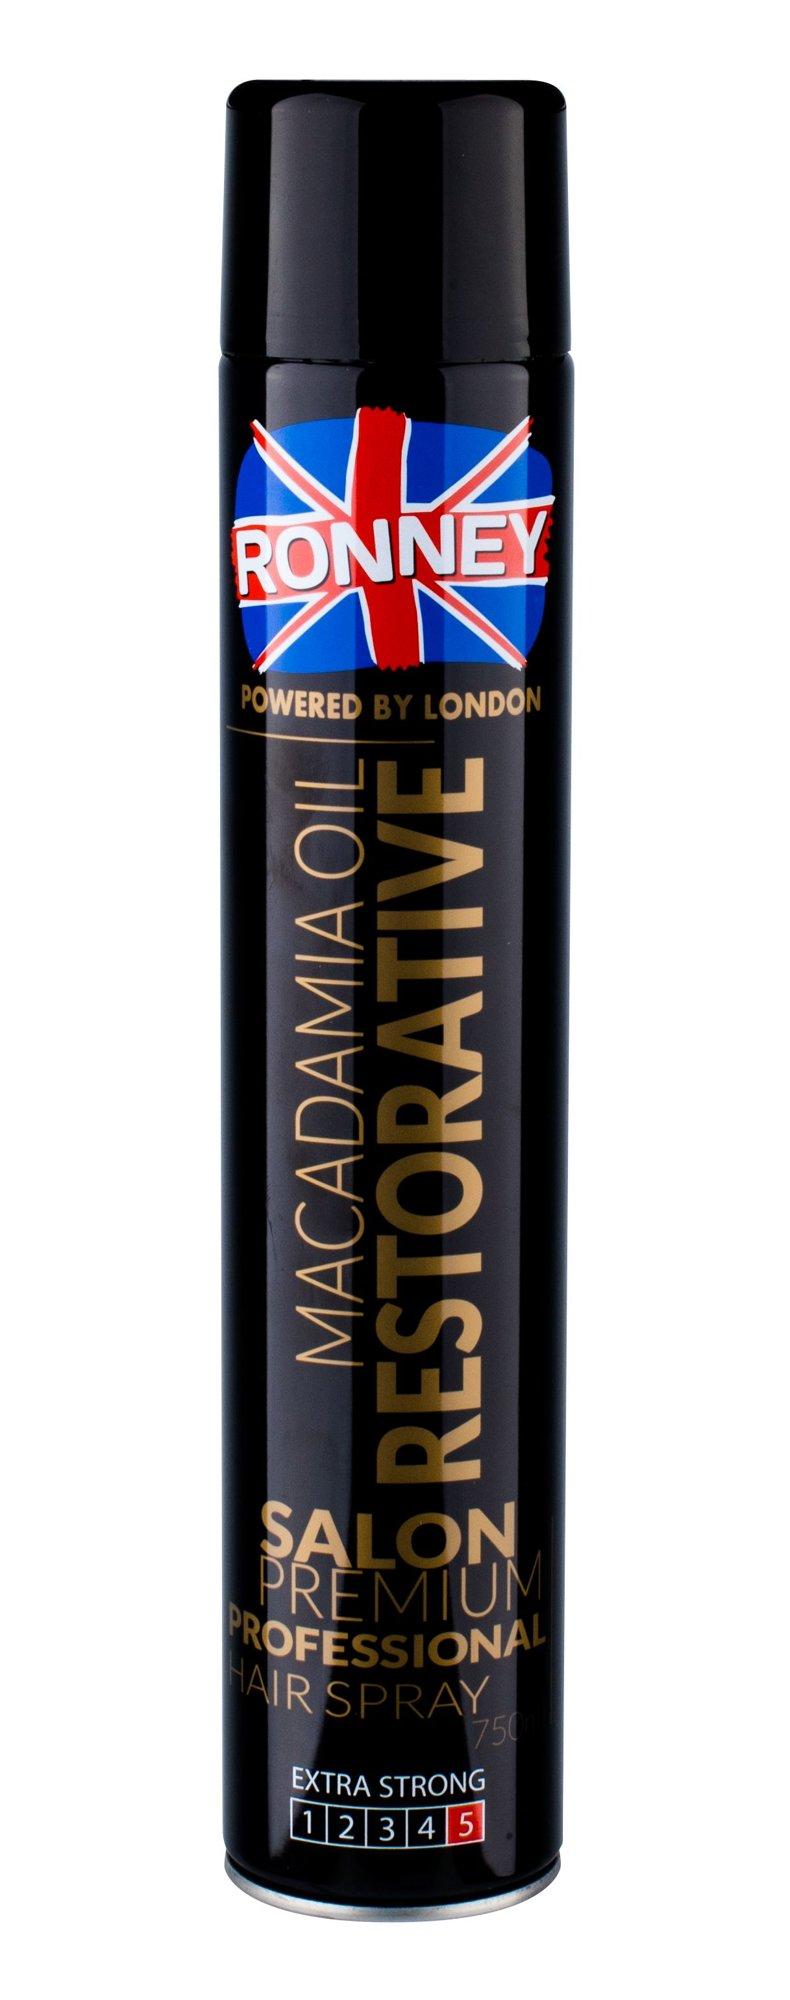 Ronney Macadamia Oil Restorative Hair Spray Cosmetic 750ml